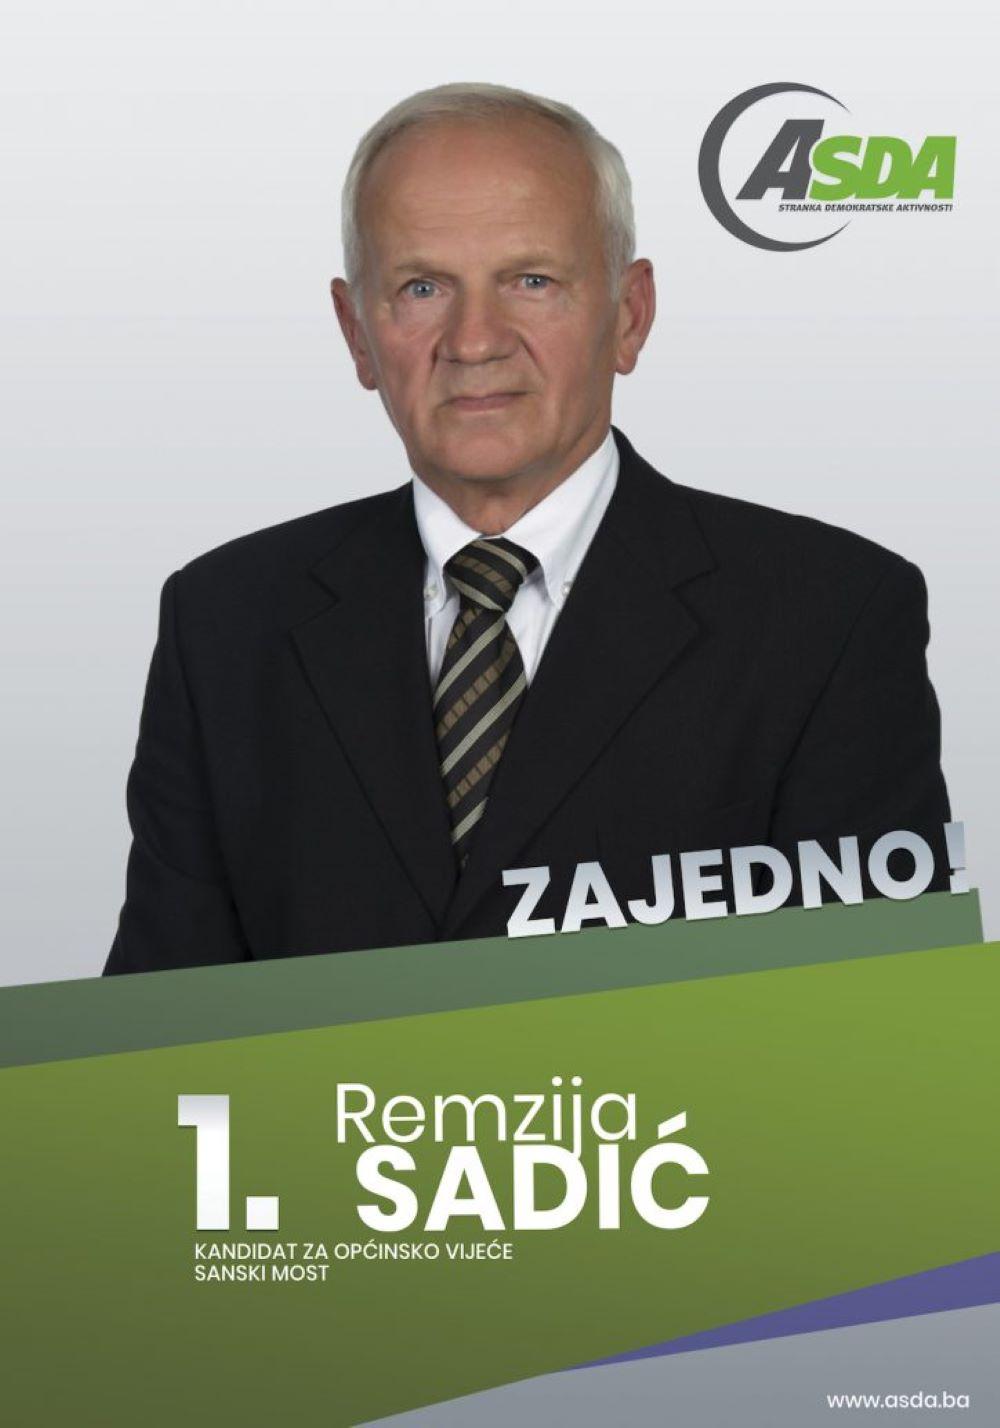 Remzija Sadić